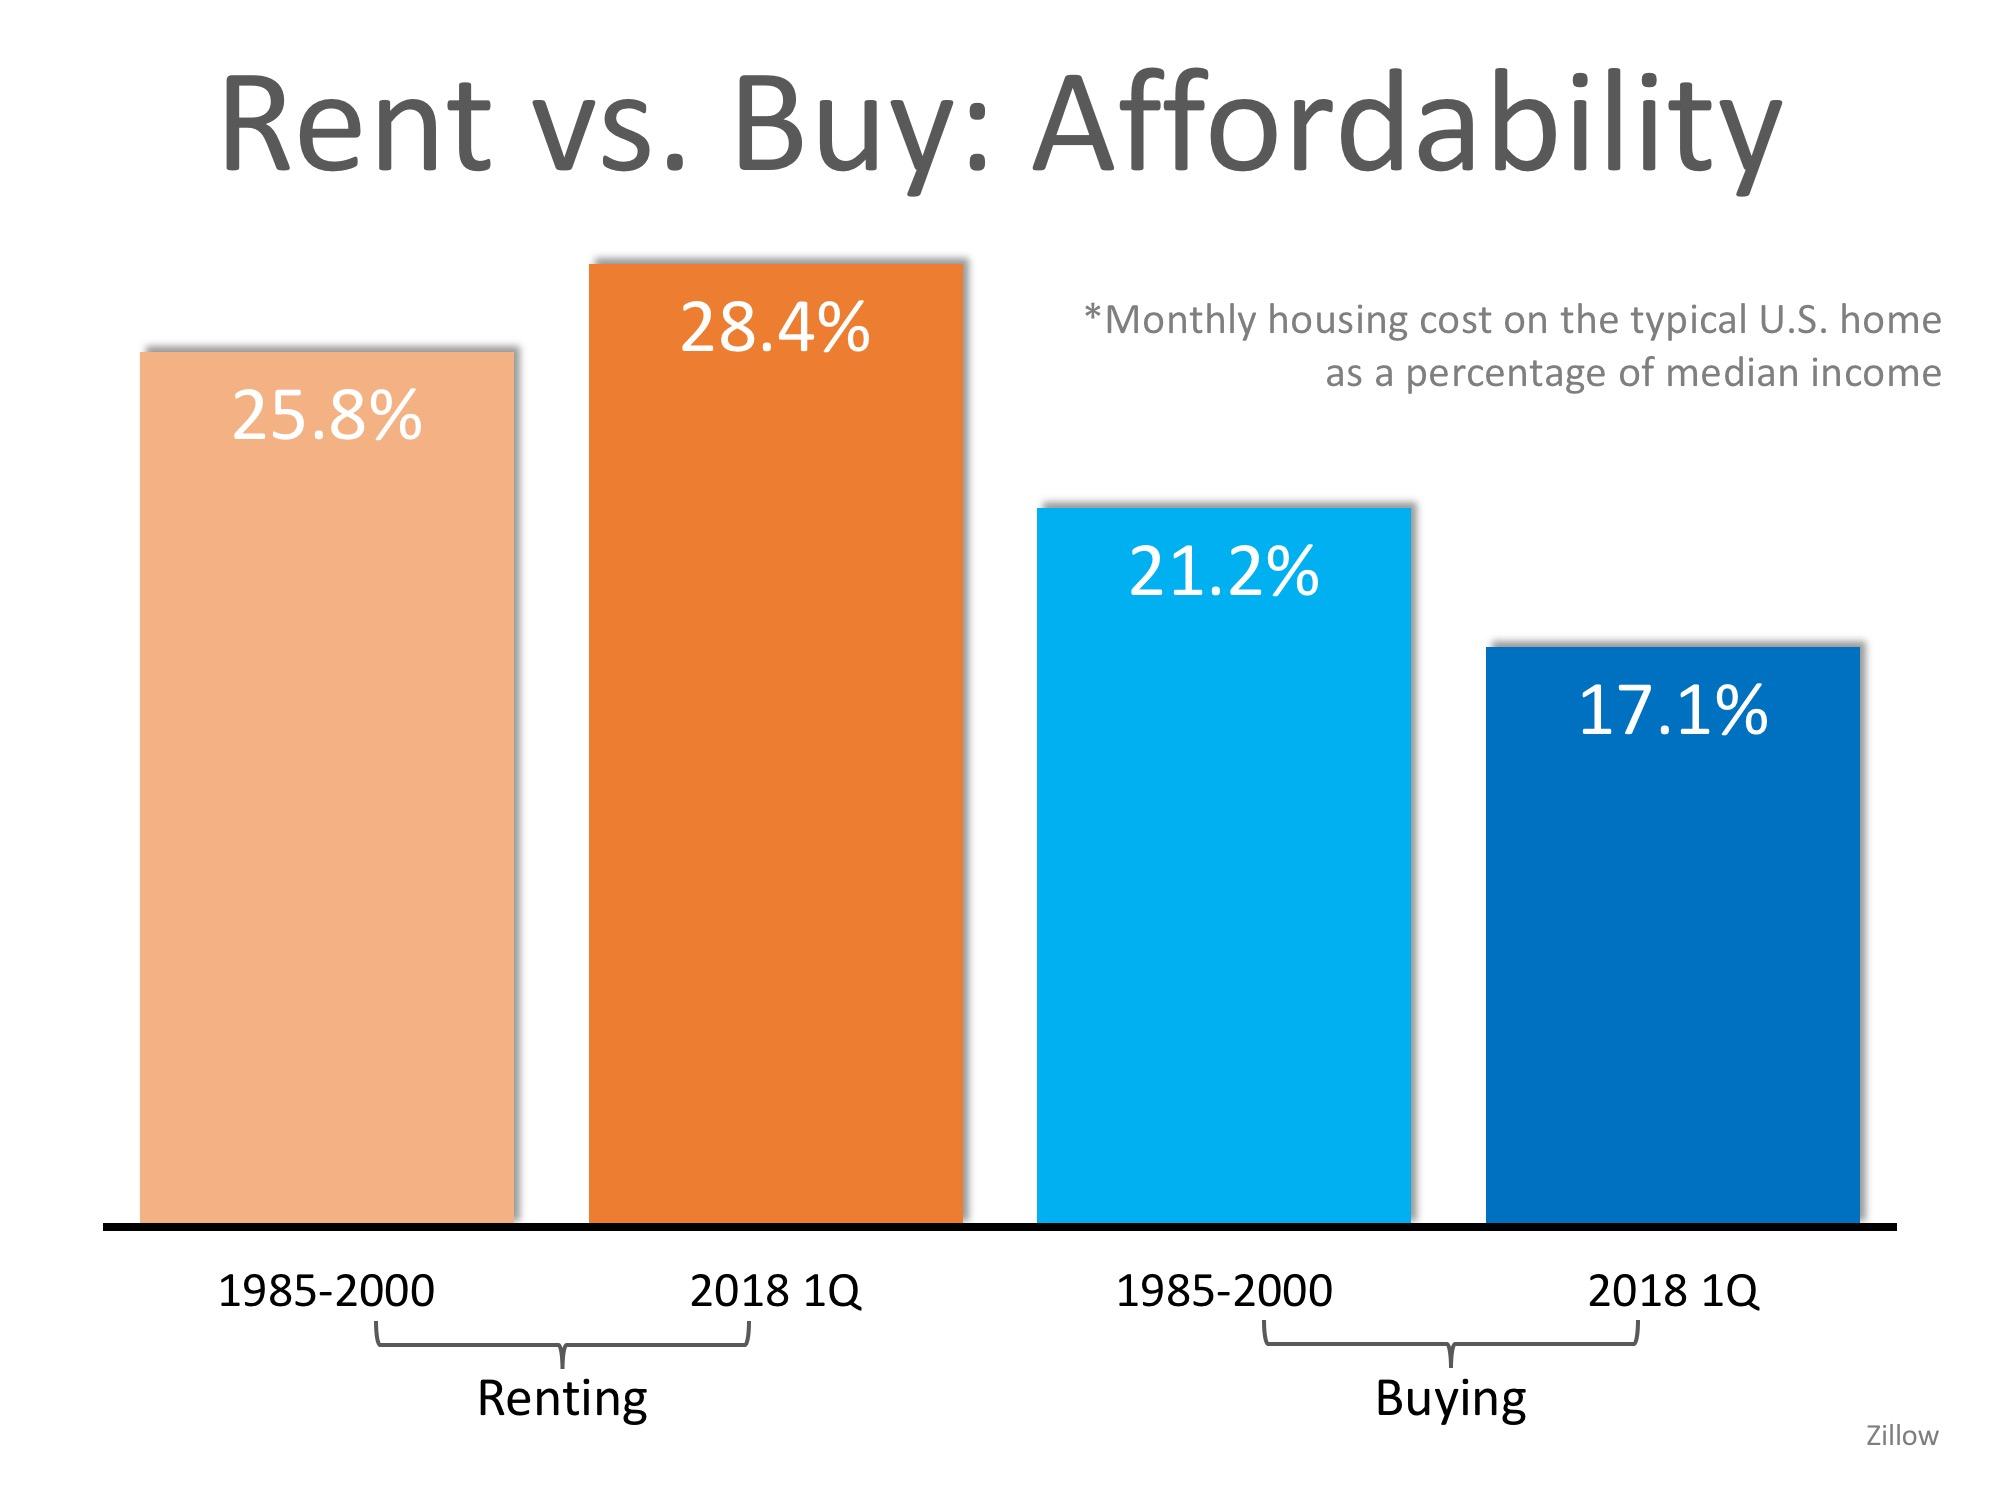 Rent vs. Buy: Affordability